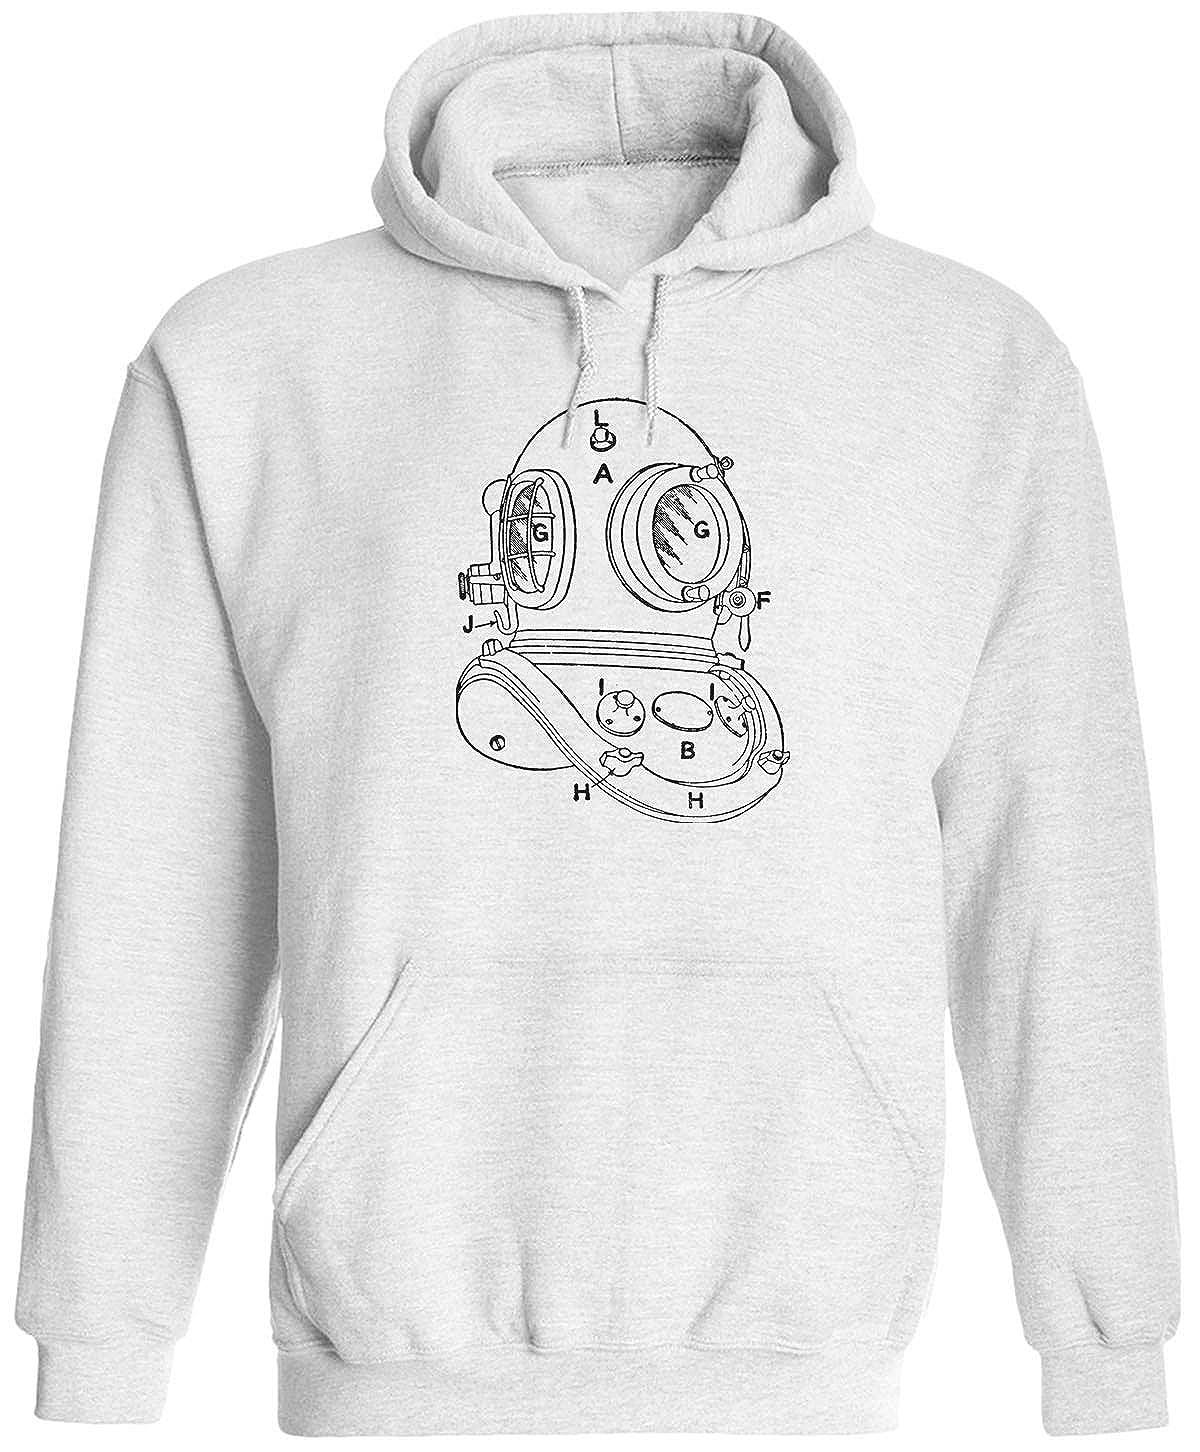 Austin Ink Apparel Antique Diving Helmet Unisex Adult Hooded Pullover Sweatshirt